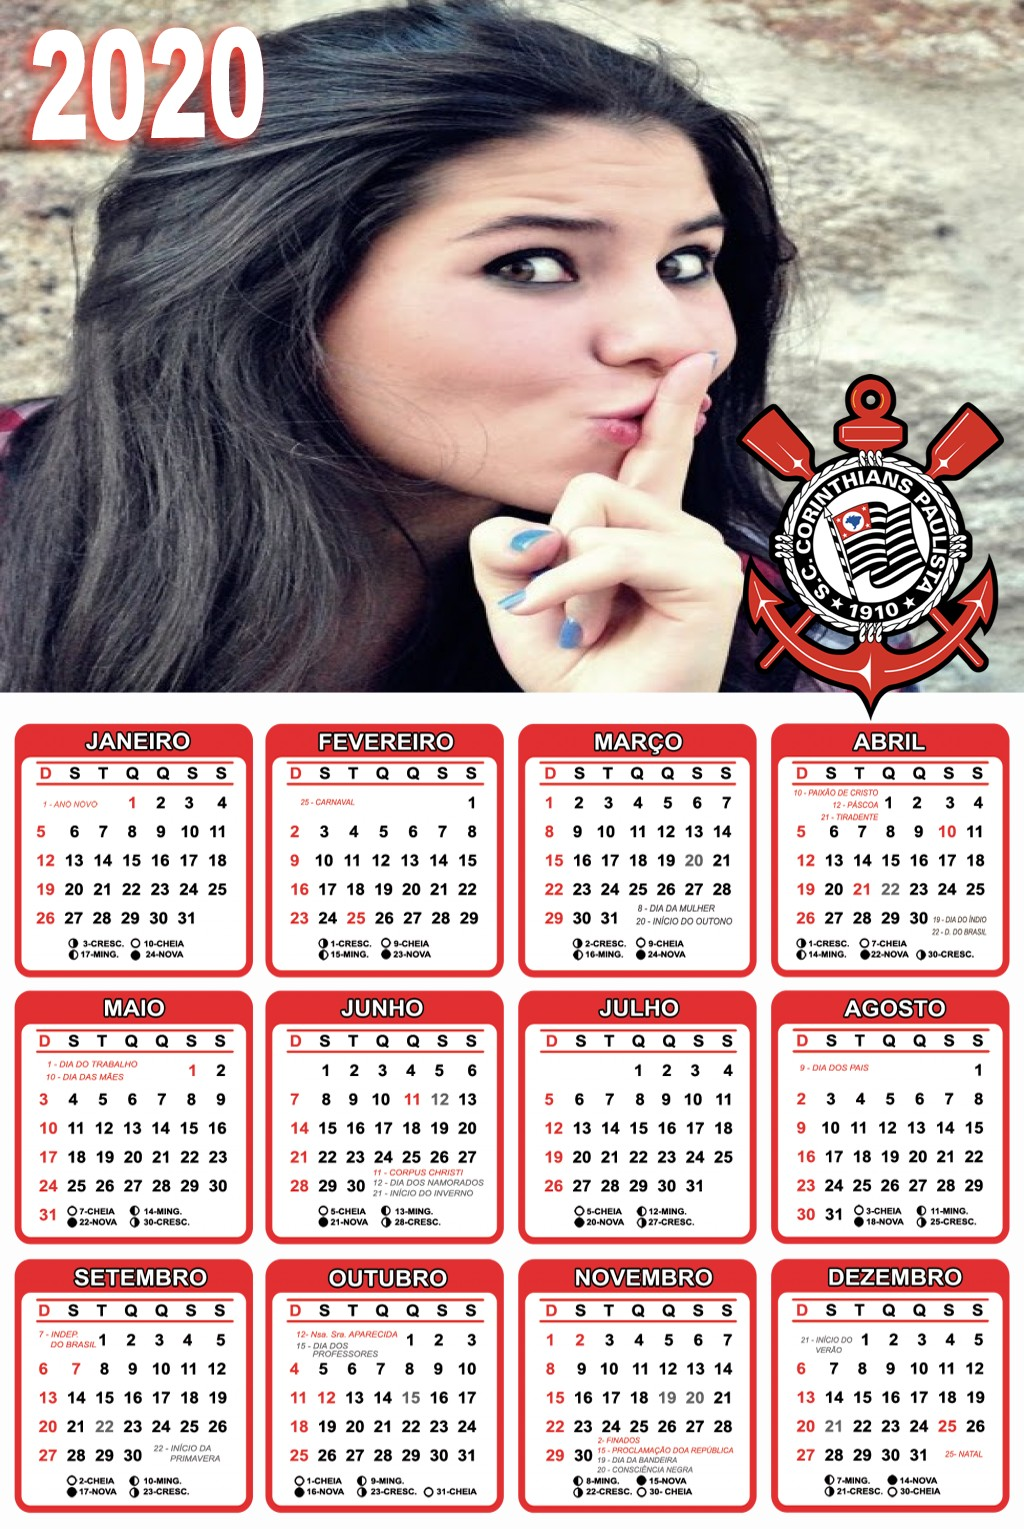 moldura-calendario-2020-corinthians